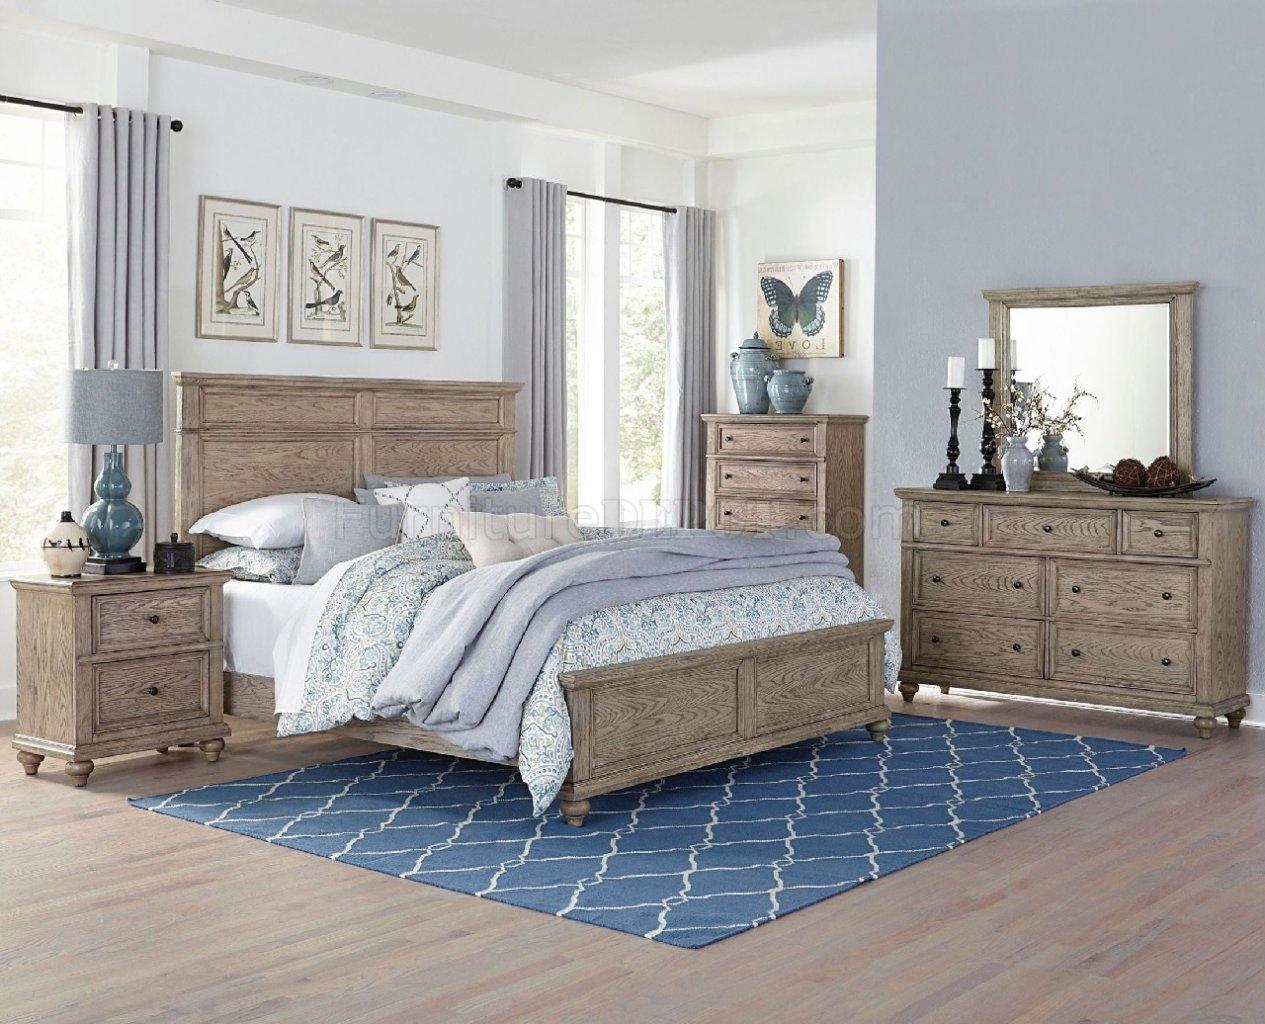 Awobf43 Amusing Whitewashed Oak Bedroom Furniture Today 2021 01 31